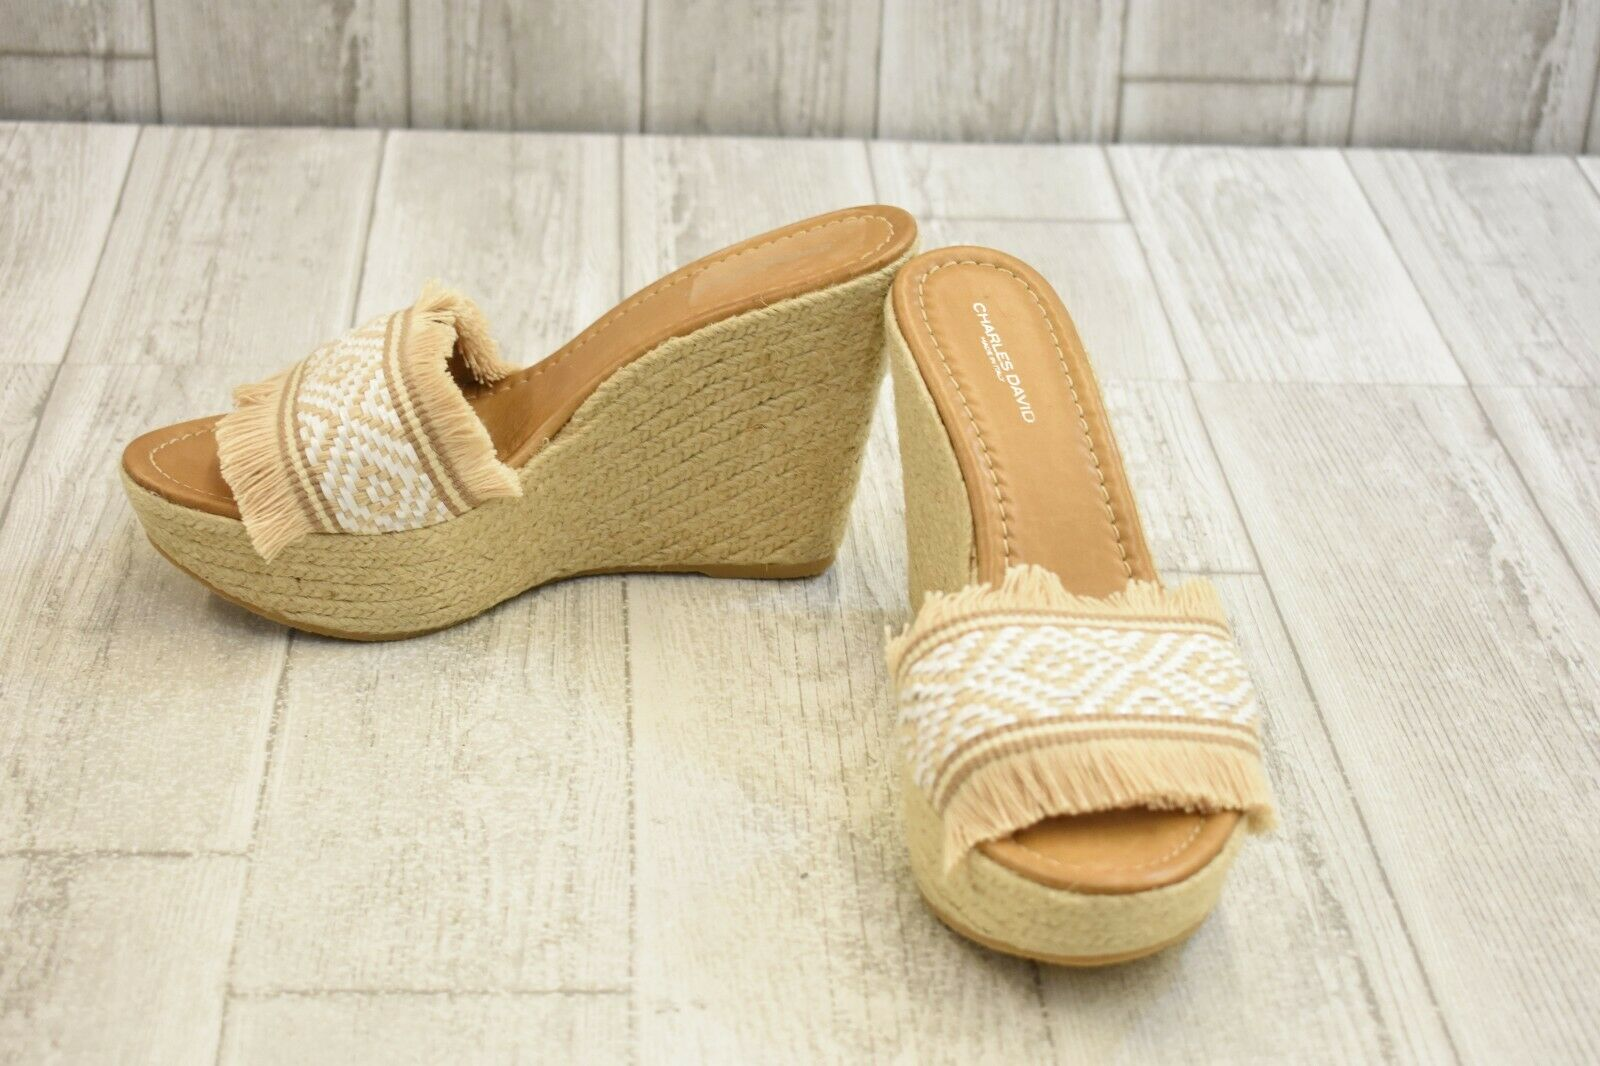 Charles David Dana Wedge Sandal - Women's Size 9.5, White Wheat